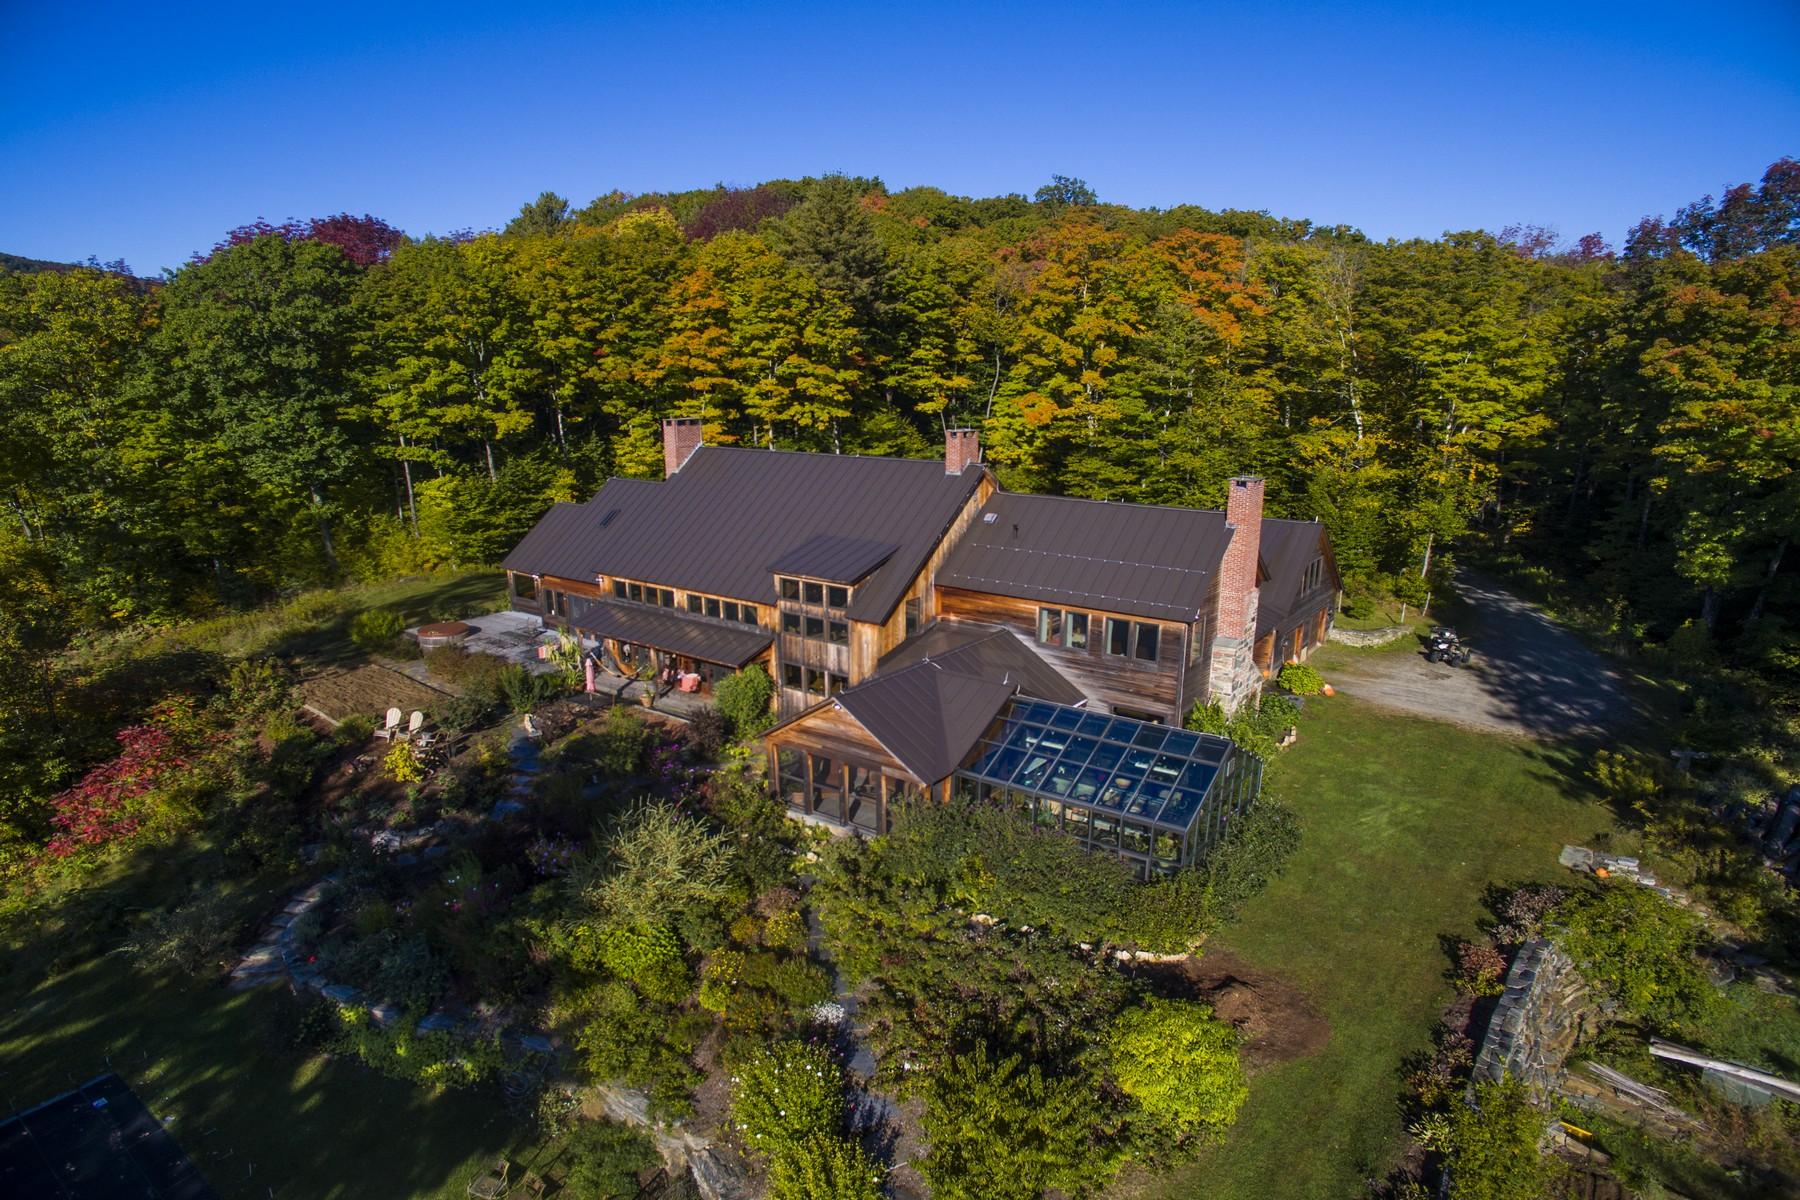 Single Family Home for Sale at 100 Fairbanks, Grafton Grafton, Vermont, 05146 United States